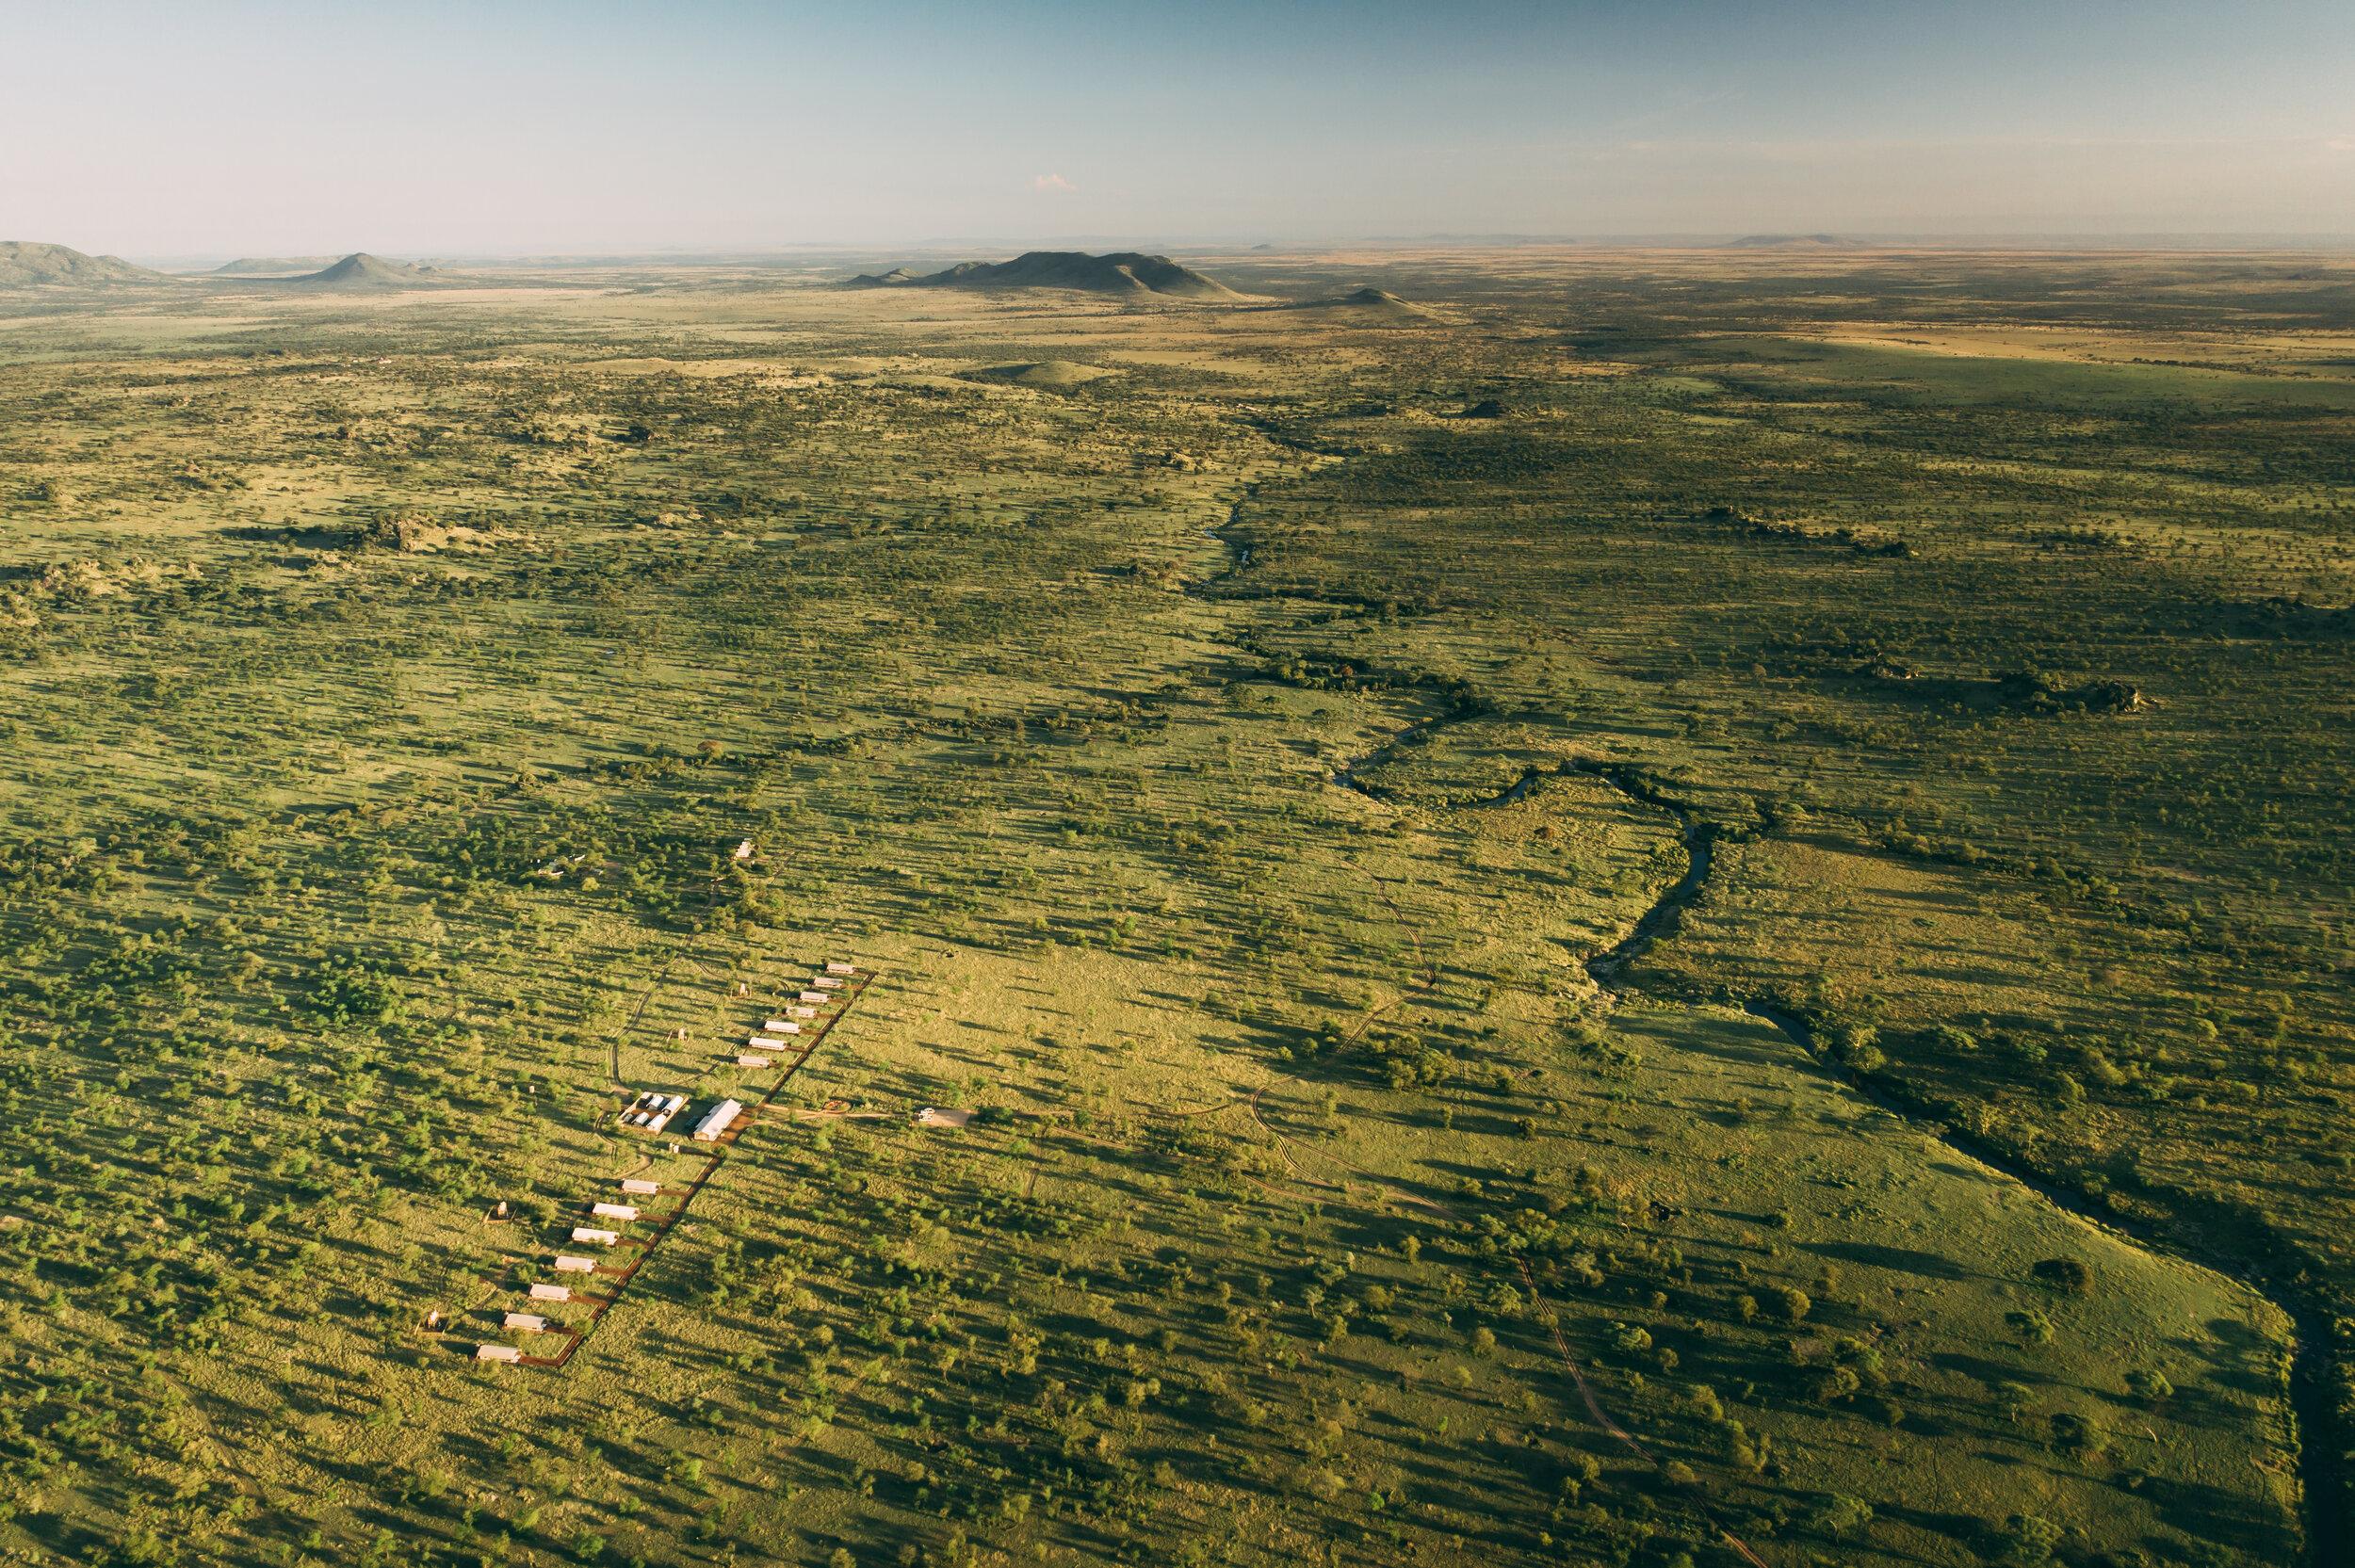 20190601_Tortilis_Serengeti_DJI_0771.jpg